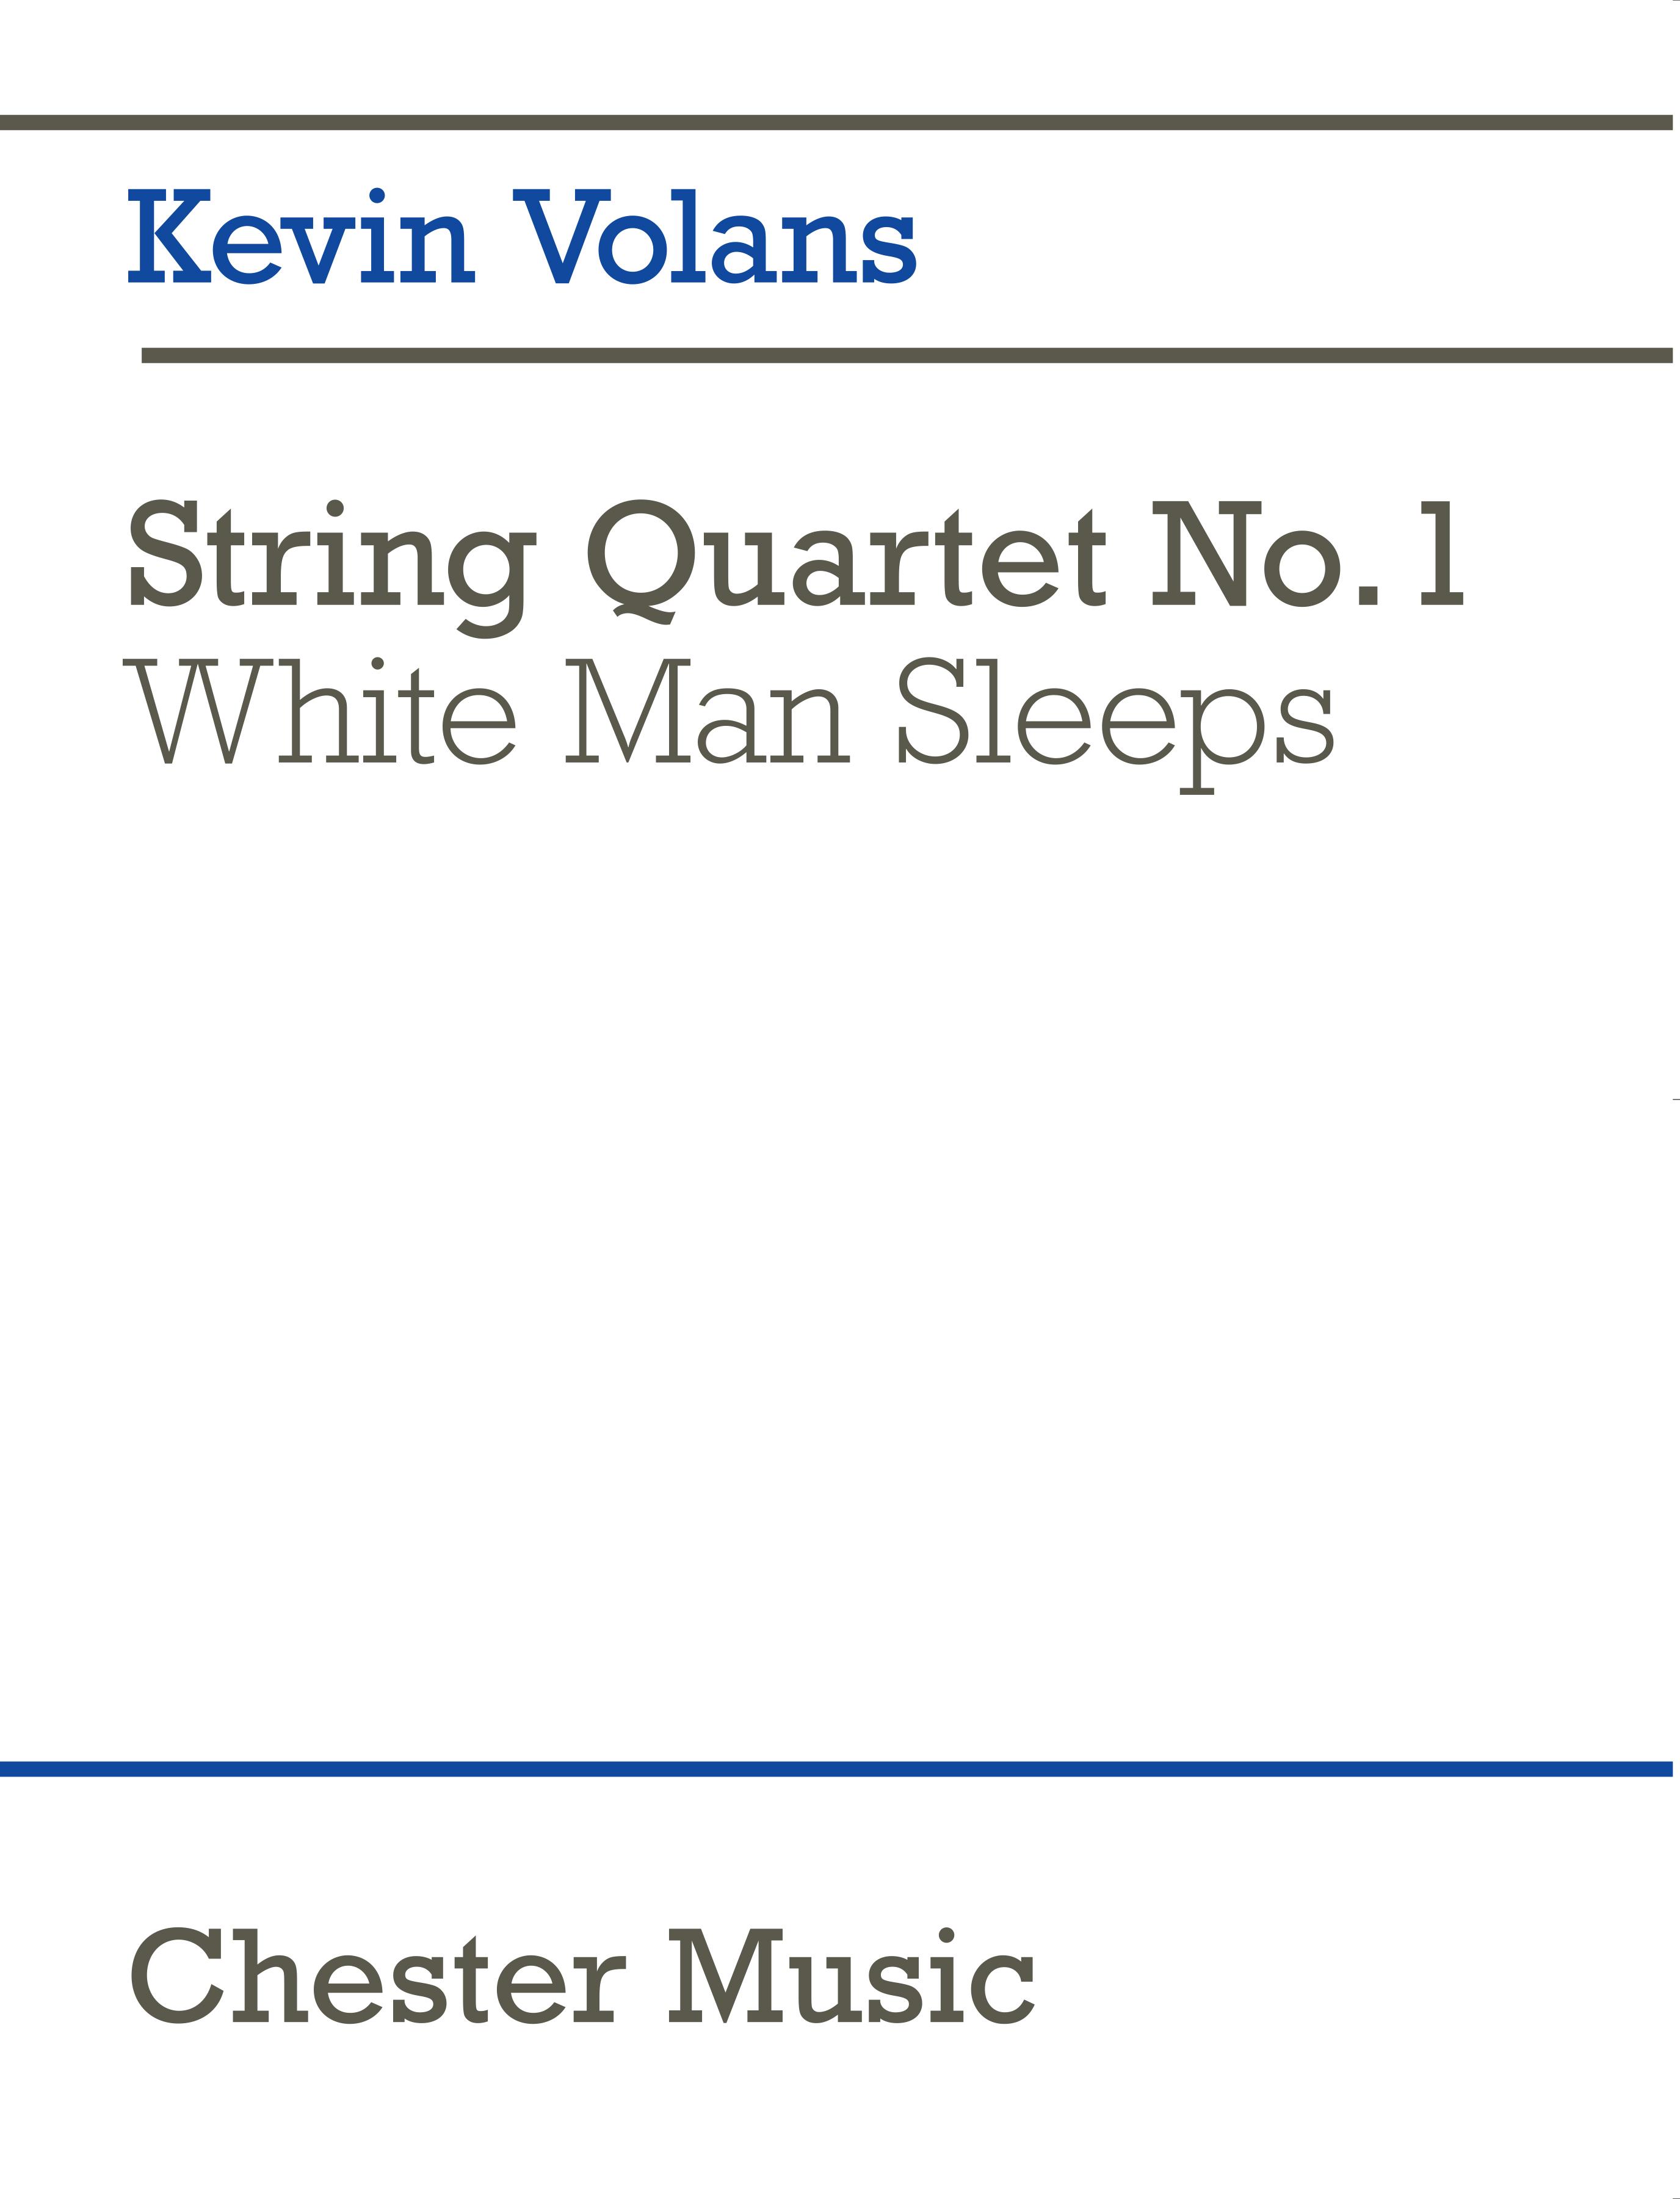 Kevin Volans: String Quartet No. 1 White Man Sleeps: String Quartet: Score